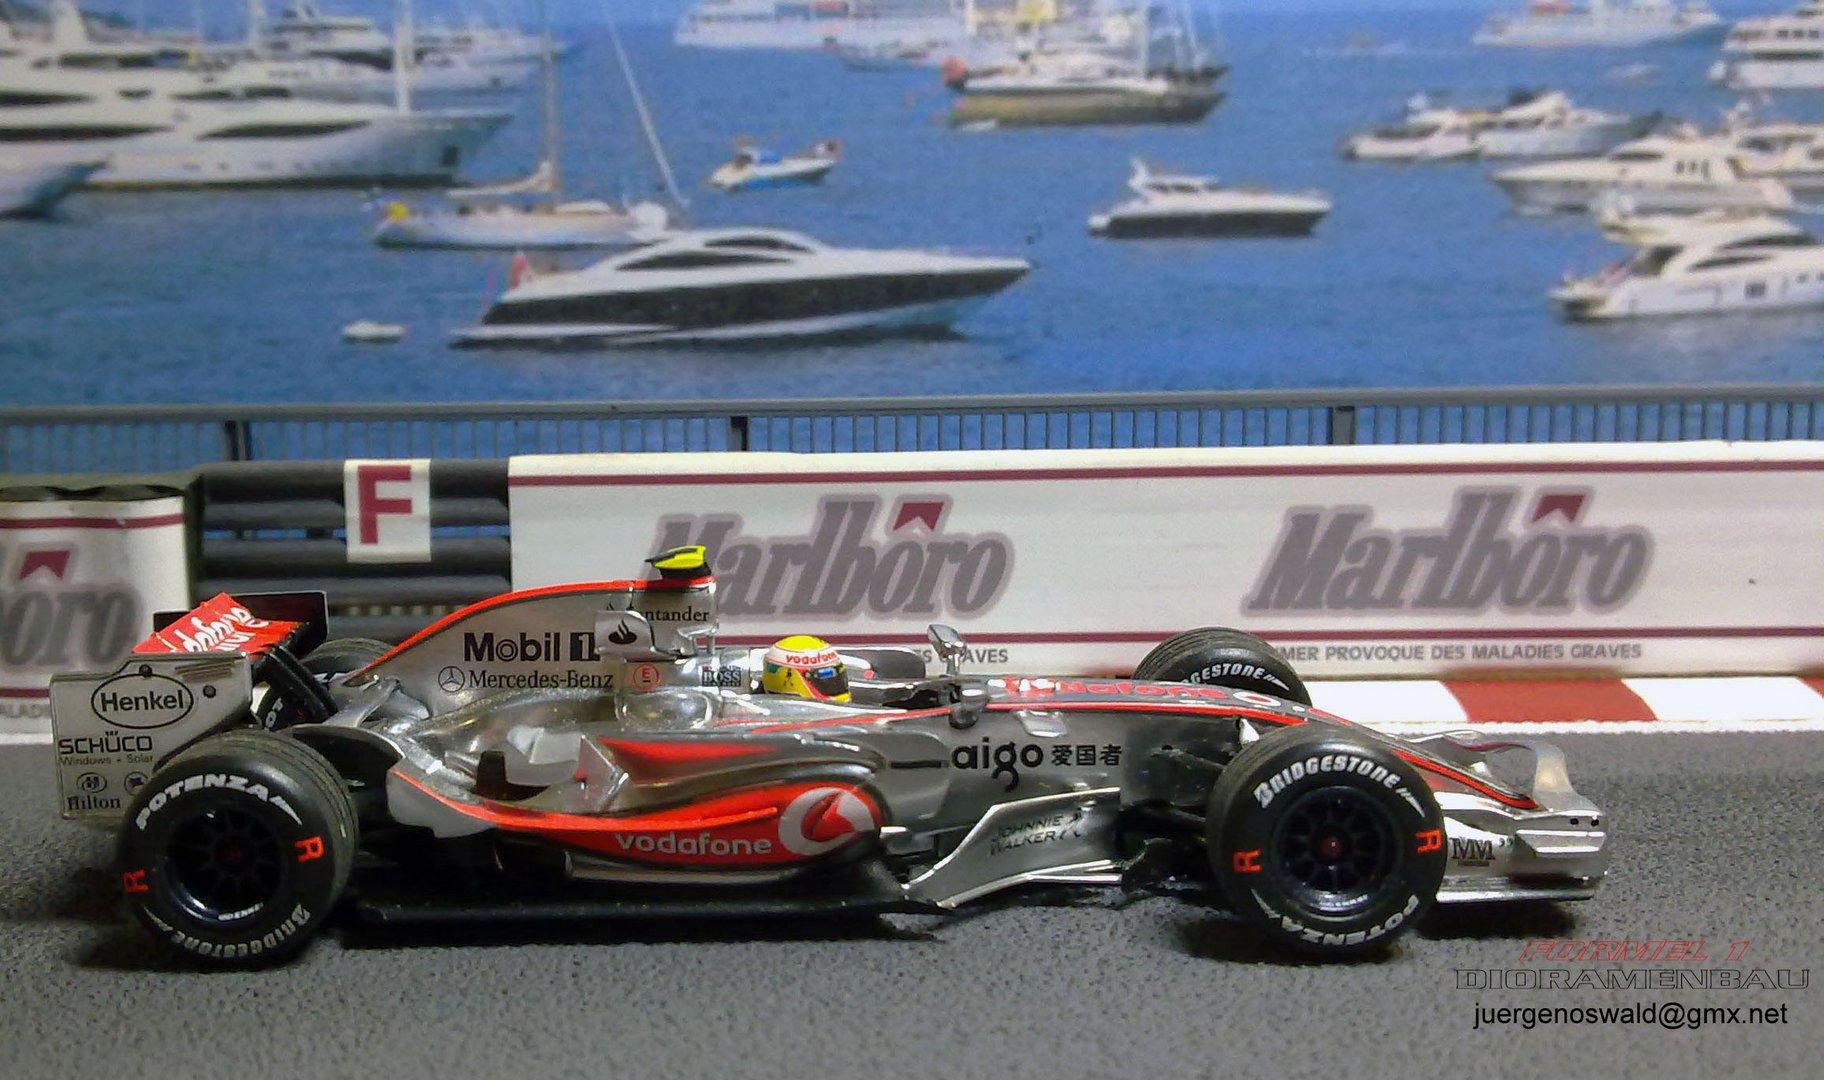 Diorama 1:43 Monaco 07 Hamilton